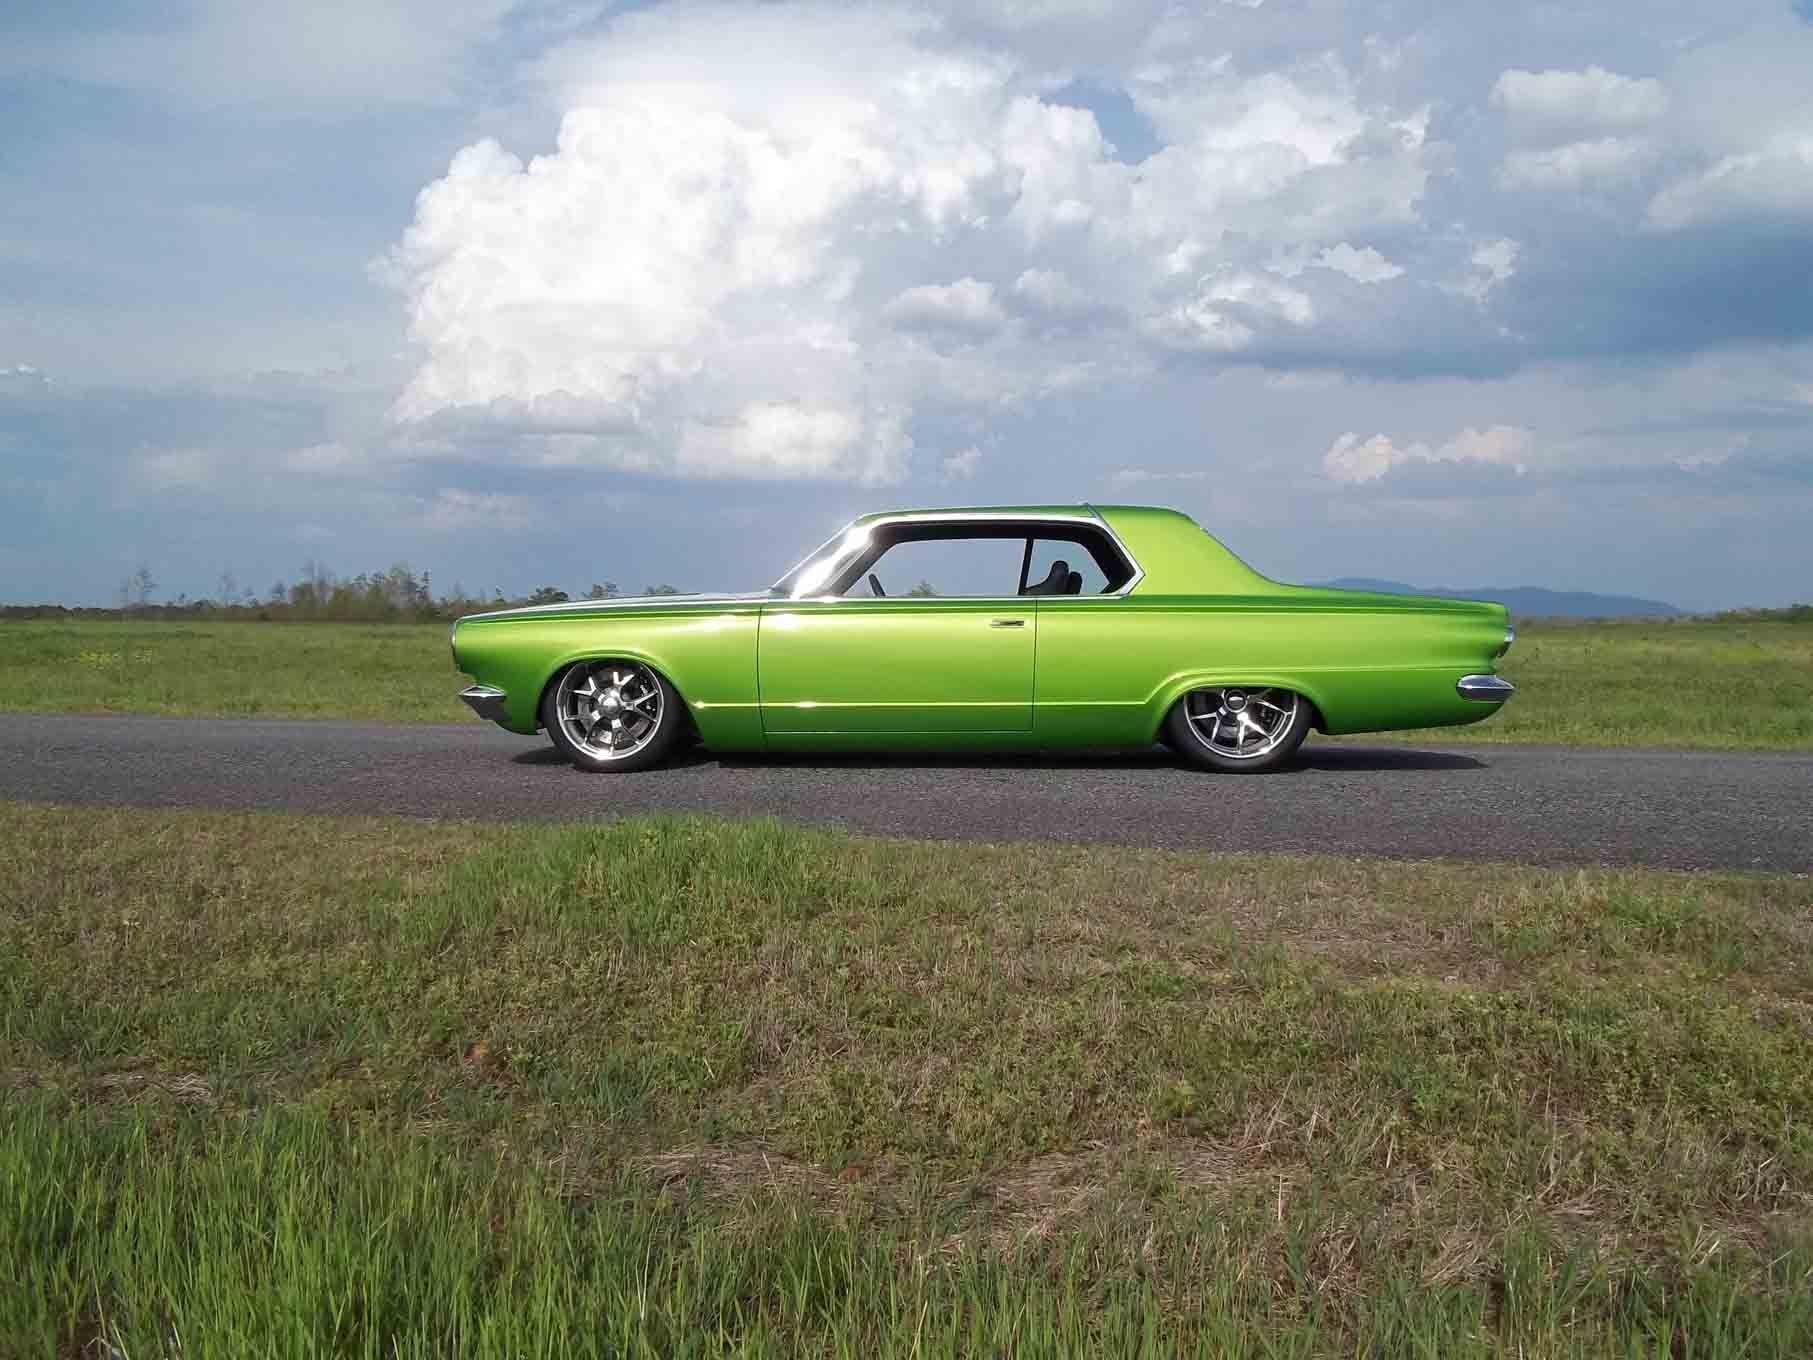 1965 dodge dart coupe hardtop street machine pro touring green usa 20 wallpaper 1813x1360 761610 wallpaperup